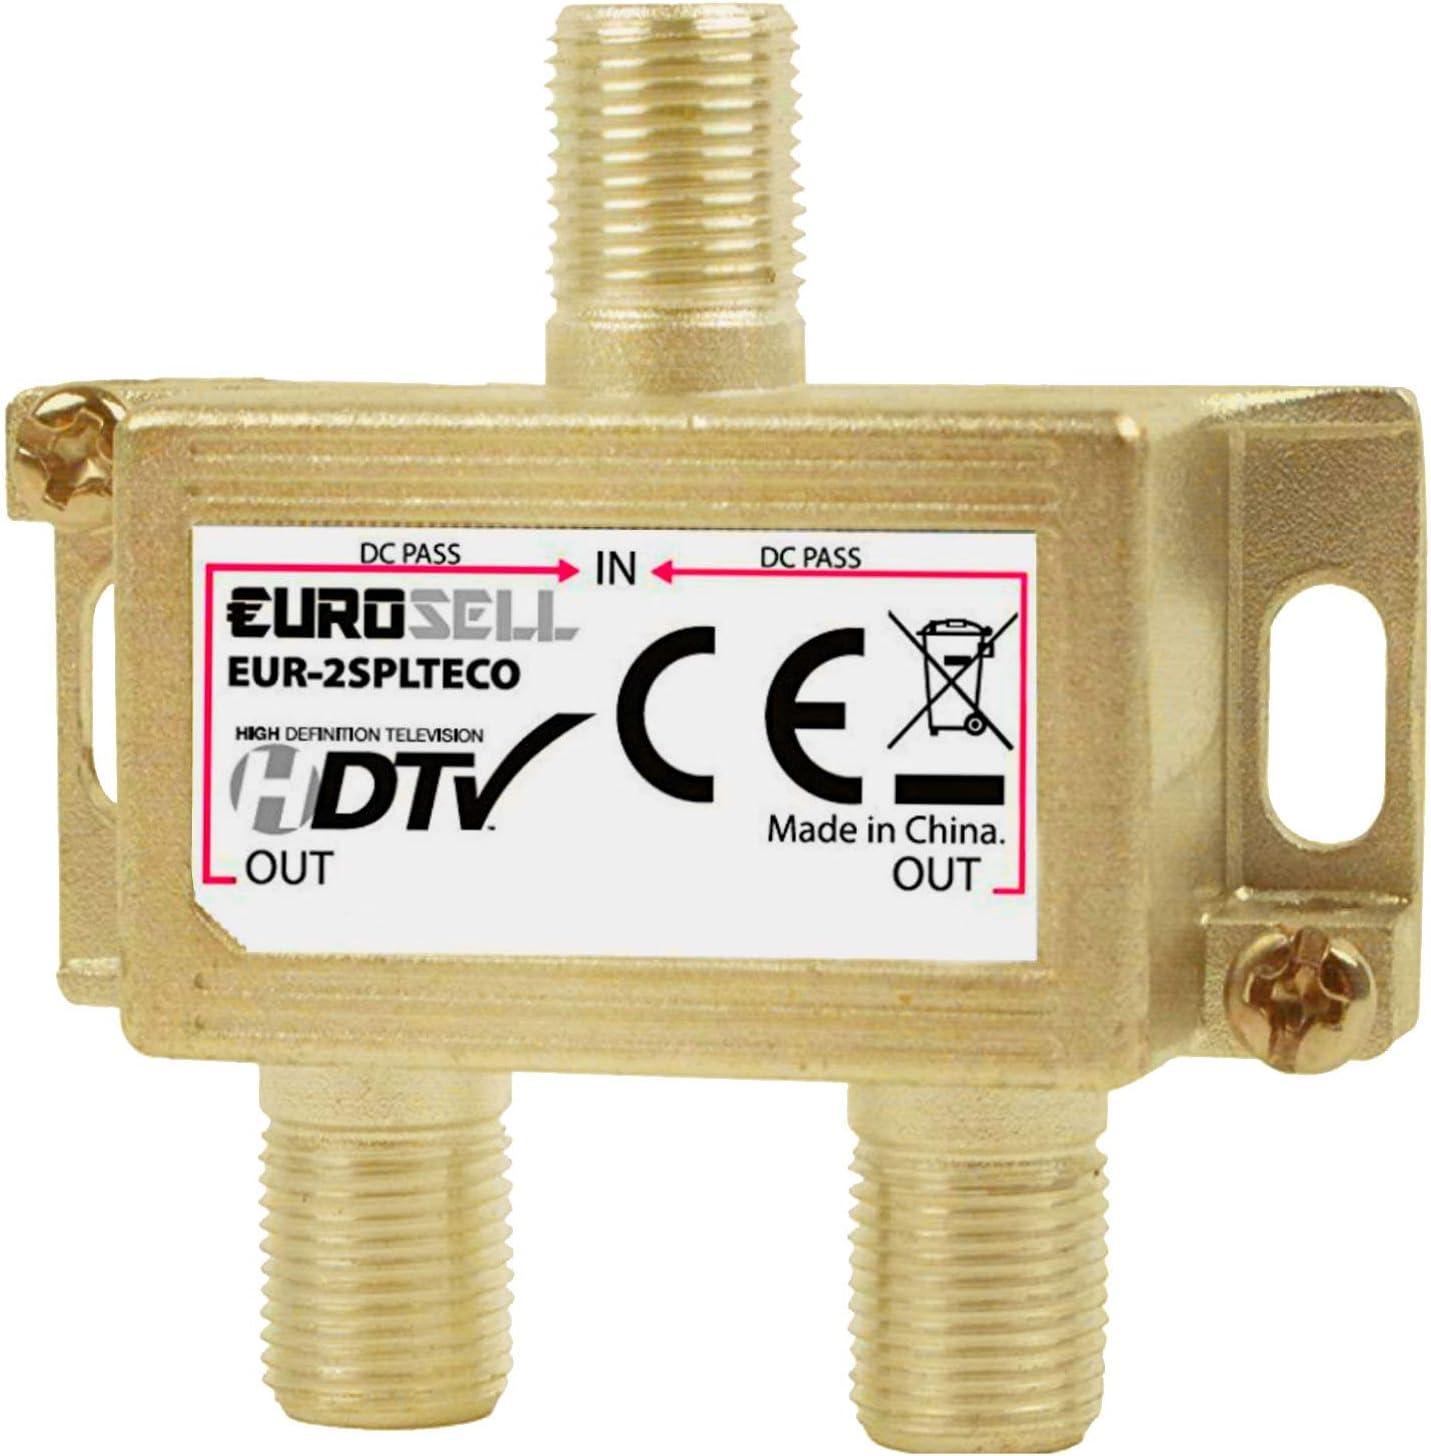 Eurosell Eco Profi Line - Distribuidor de antena (2 conductos retornos, salida de CC para DVB-C DVBC, televisión por cable Unitymedia)